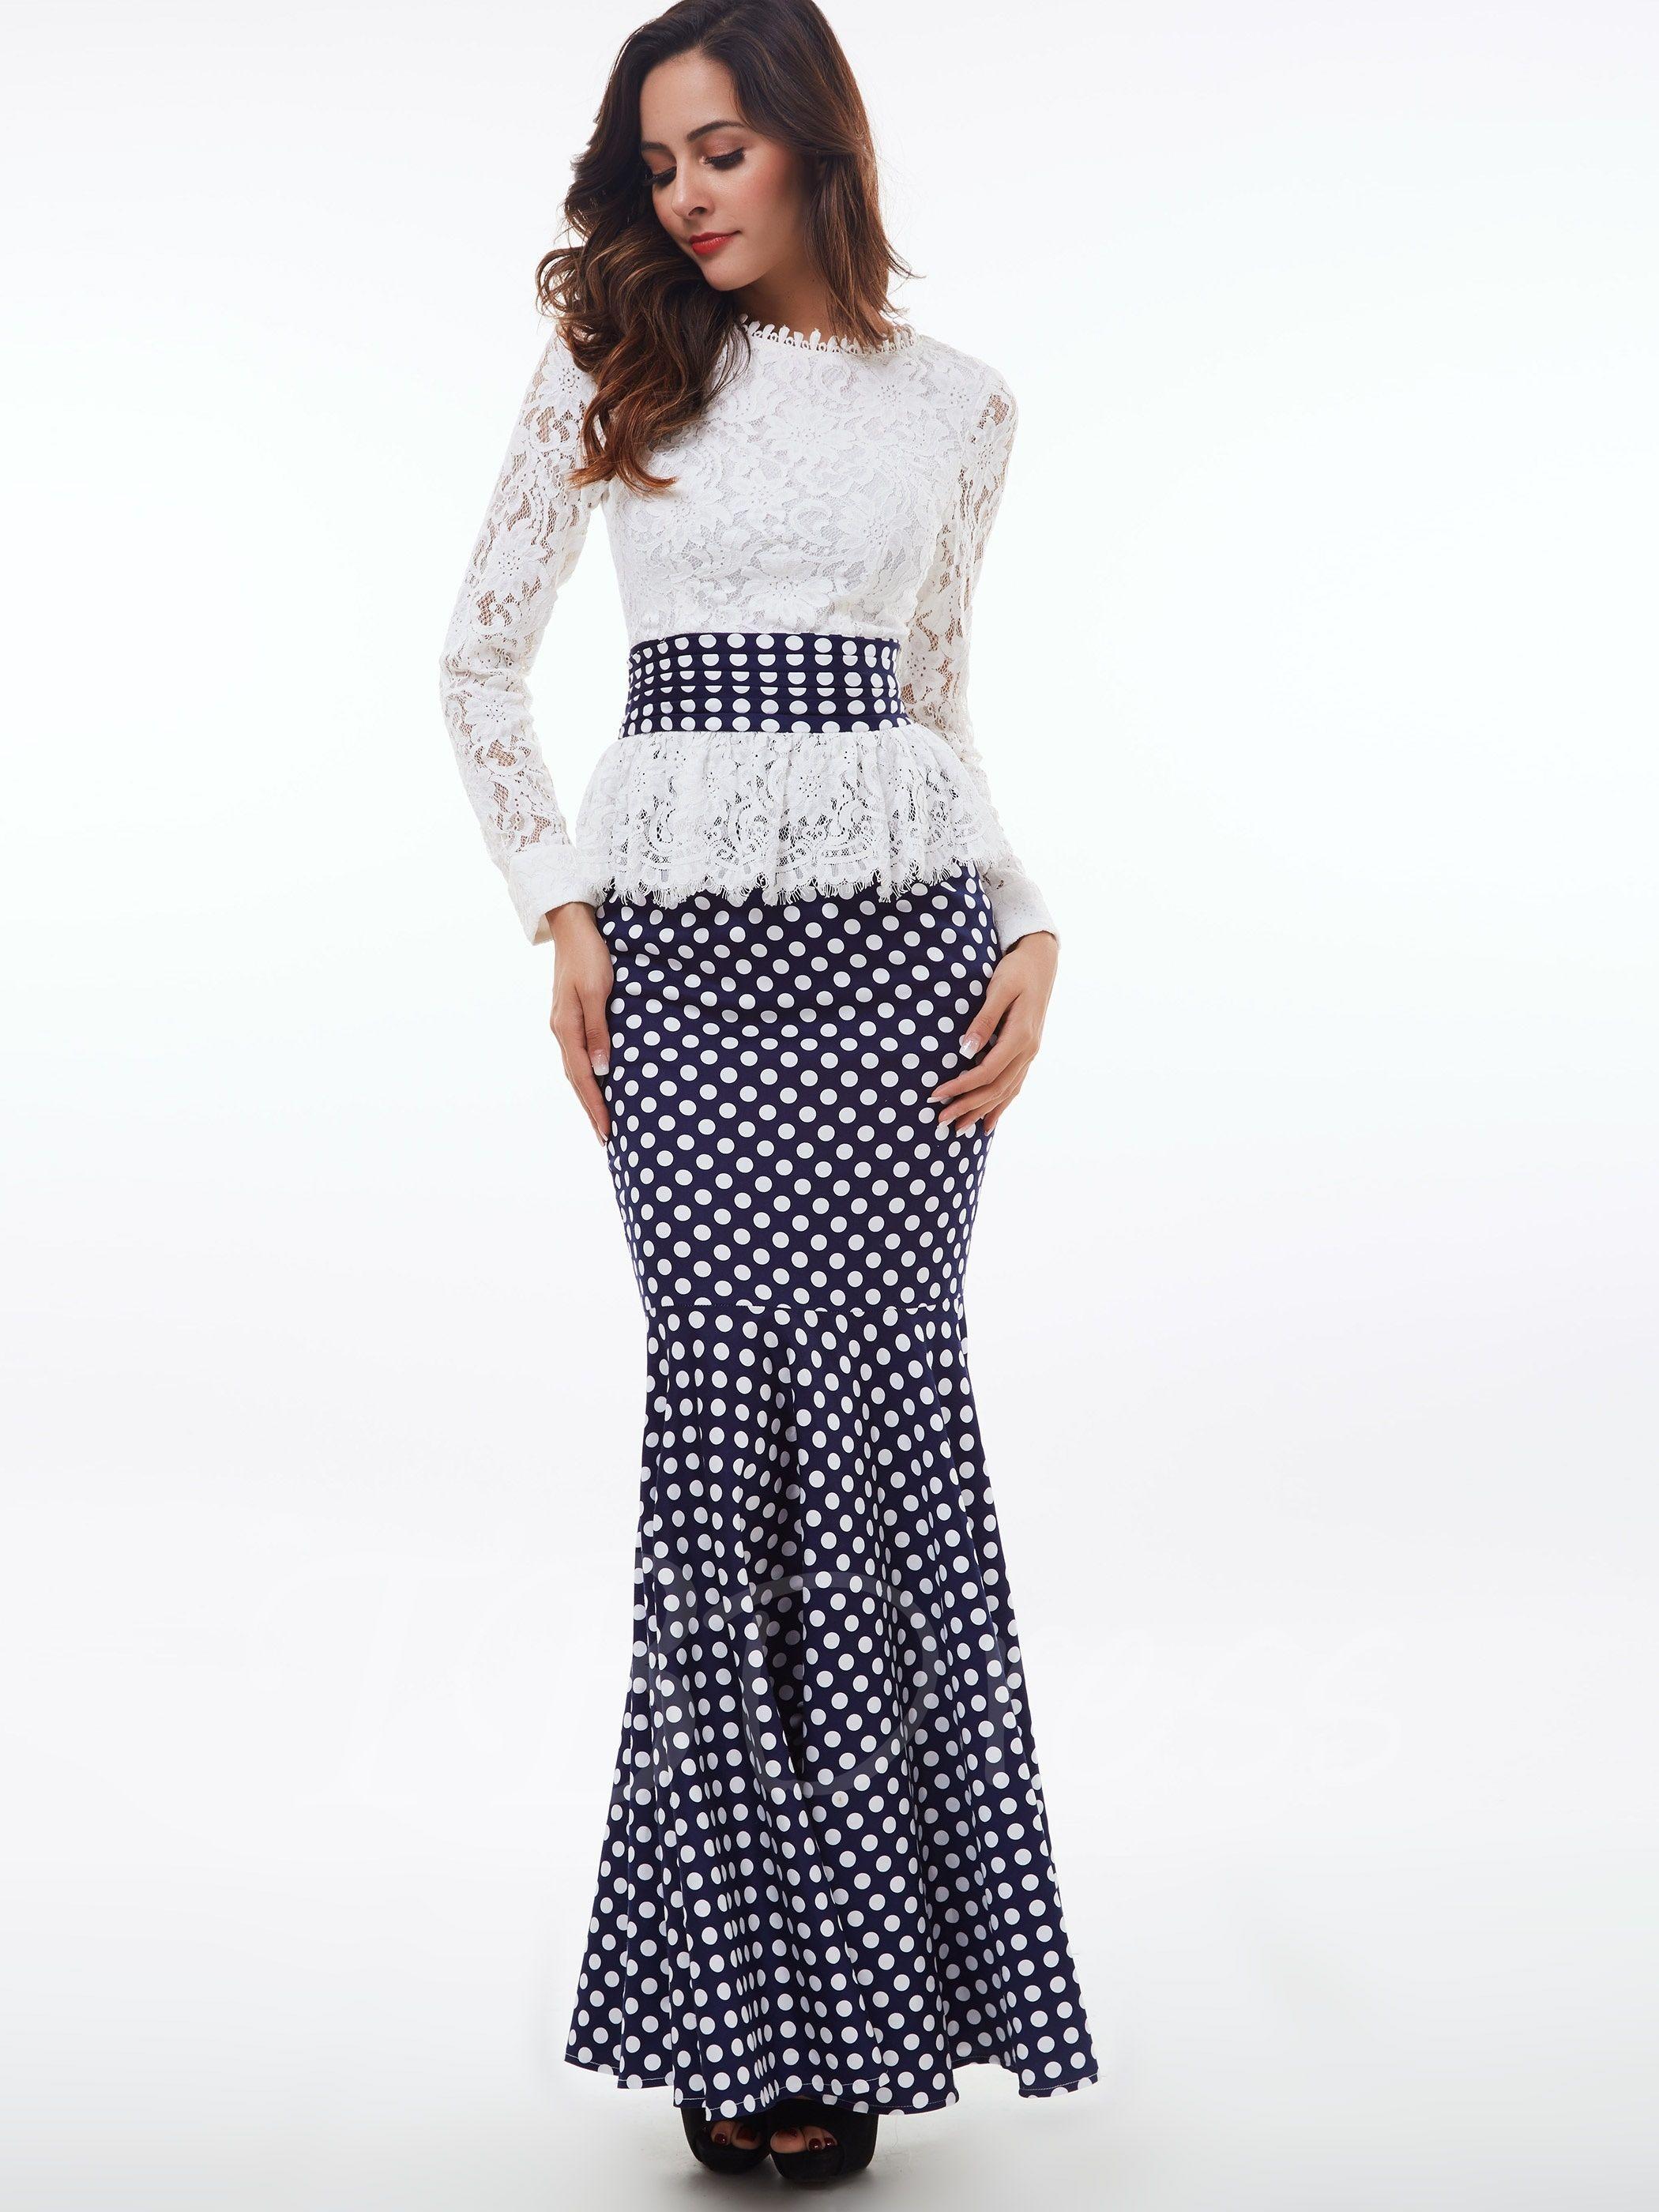 Falbala Stand Collar Lace Polka Dots Women's Maxi Dress